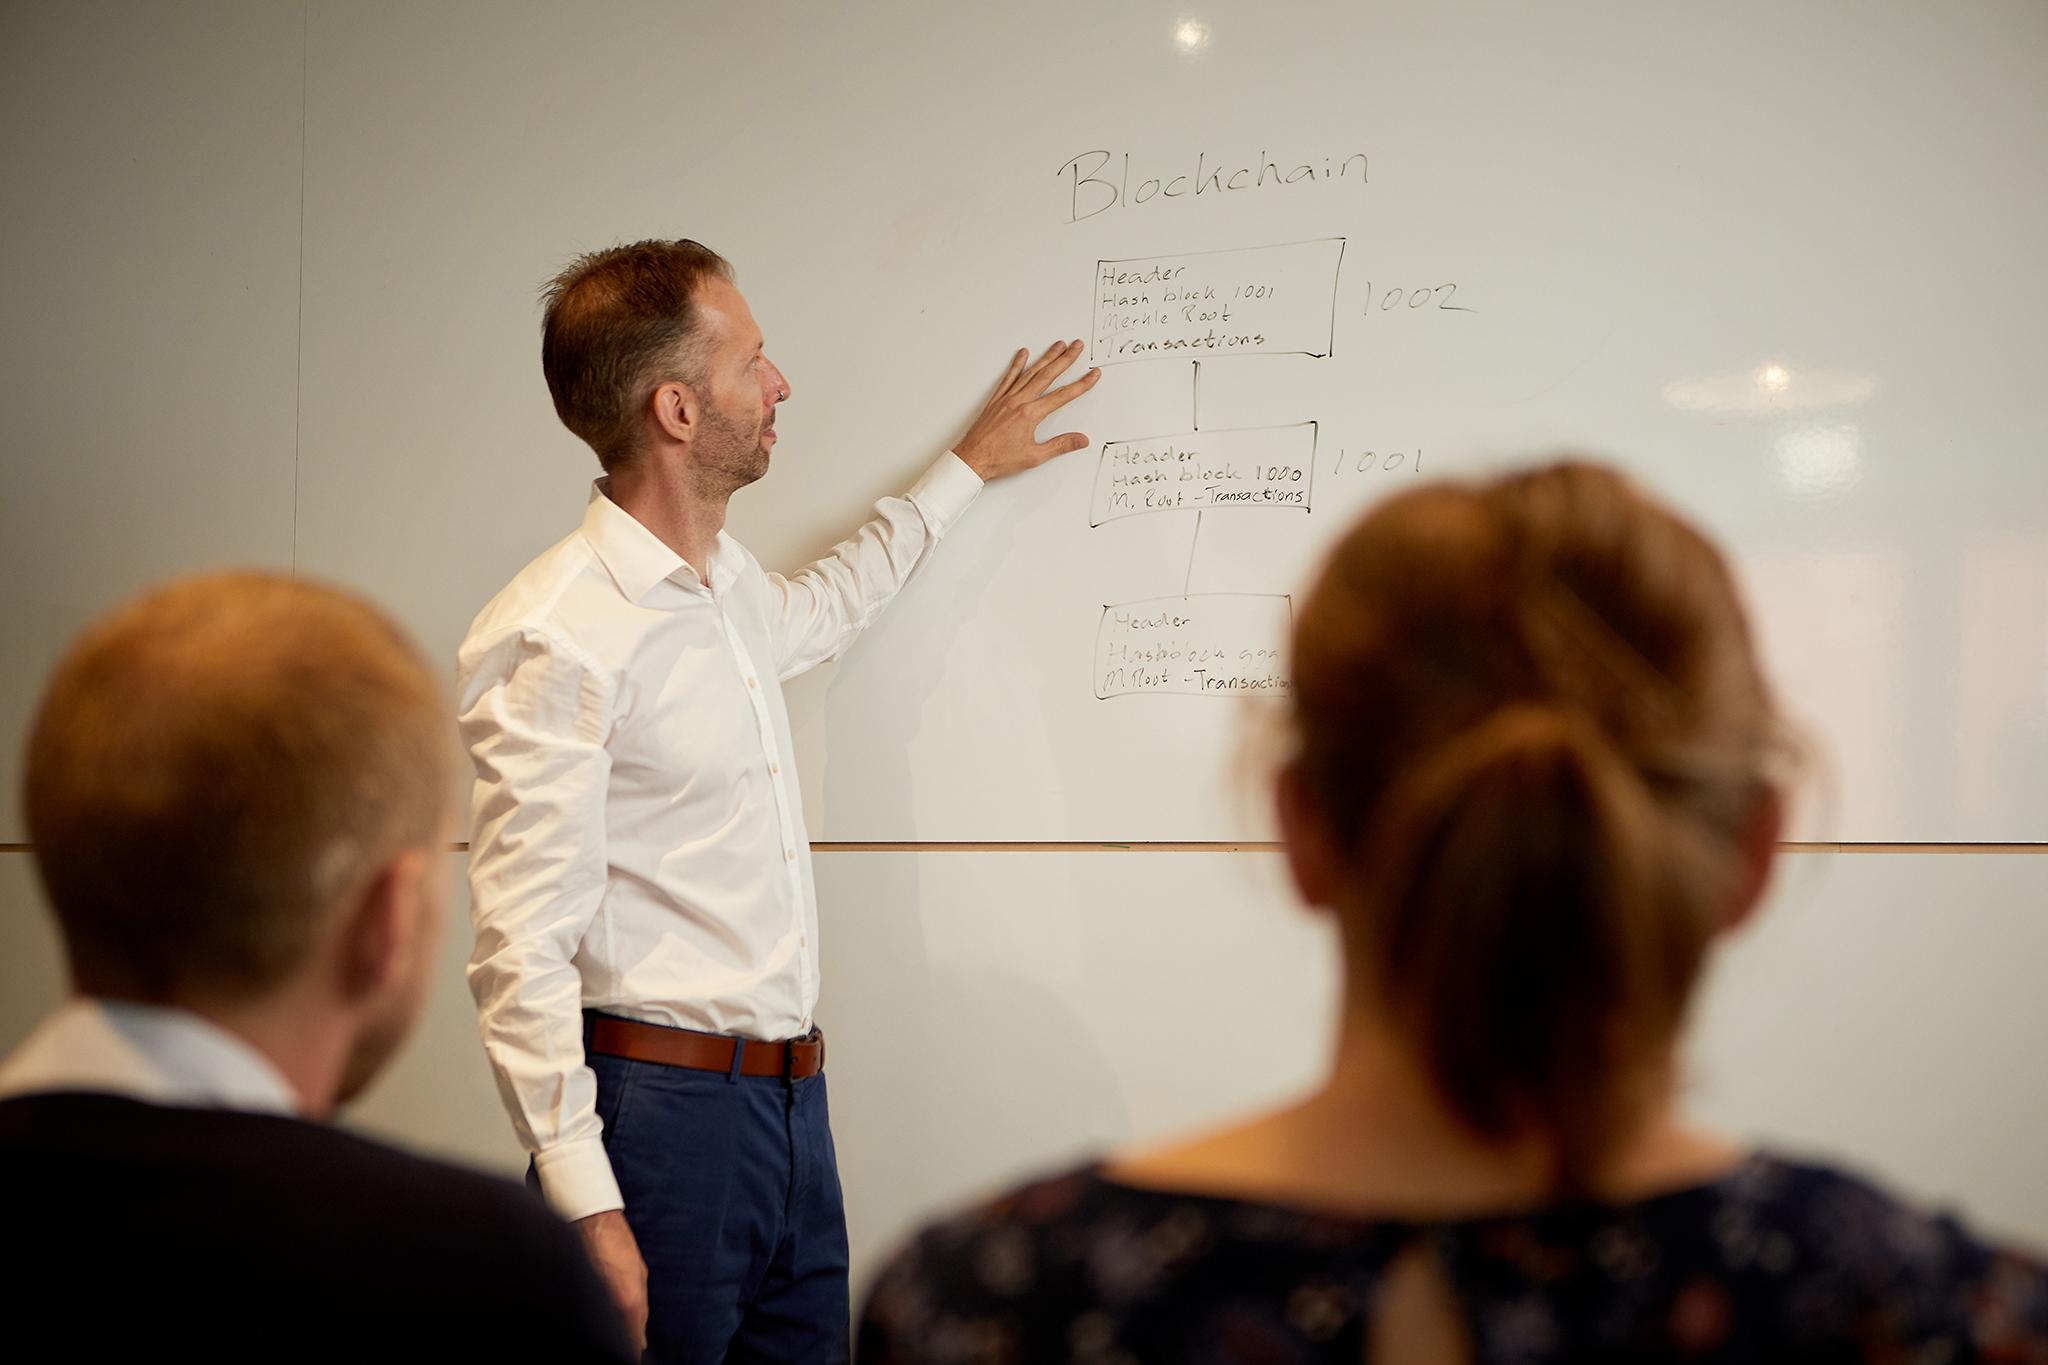 Richard Boeve - Blockchain Strategy